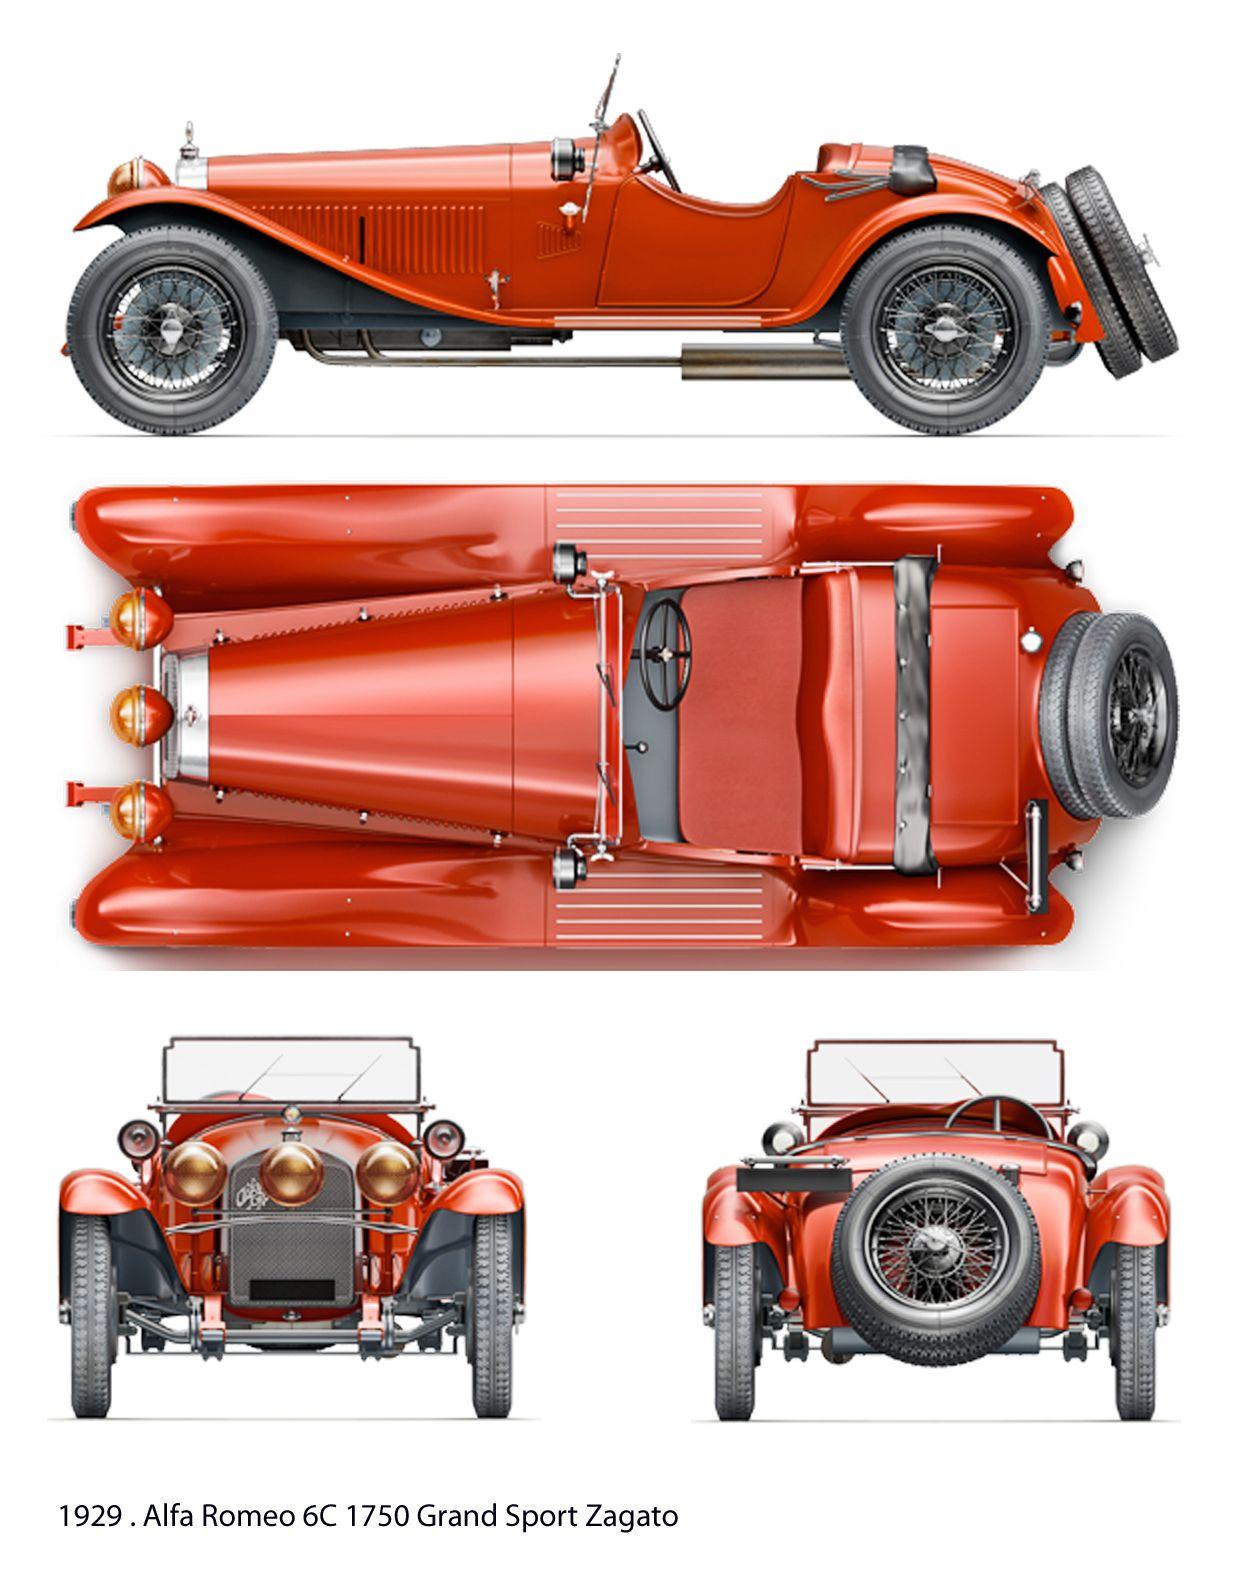 Alfa romeo 6c 1750 gs zagato 1929 smcars car blueprints alfa romeo 6c 1750 gs zagato 1929 smcars car blueprints malvernweather Choice Image